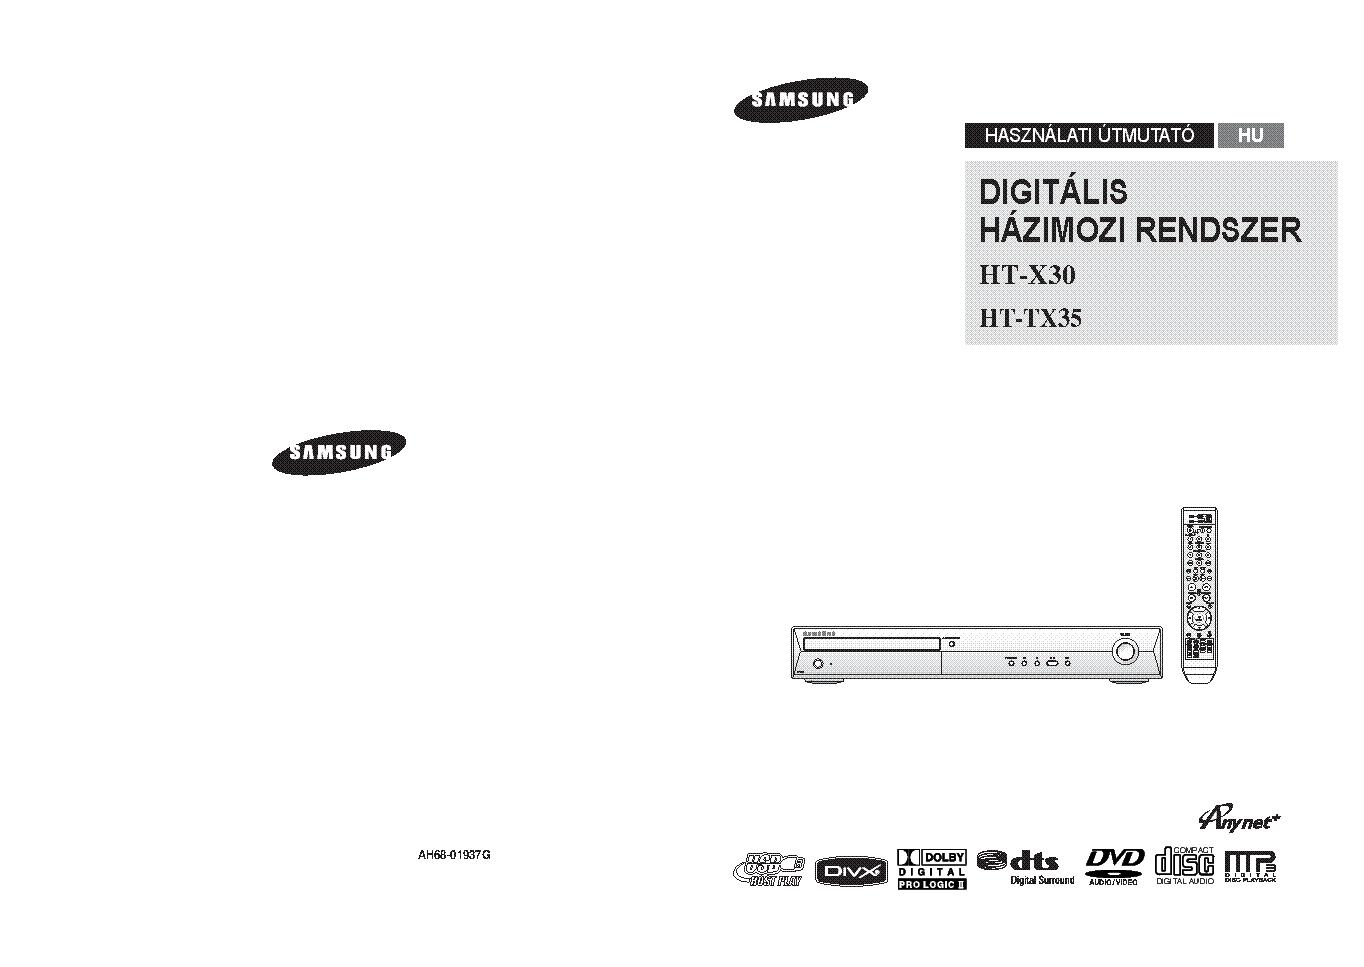 Samsung ht x30 service manual download, schematics, eeprom, repair.